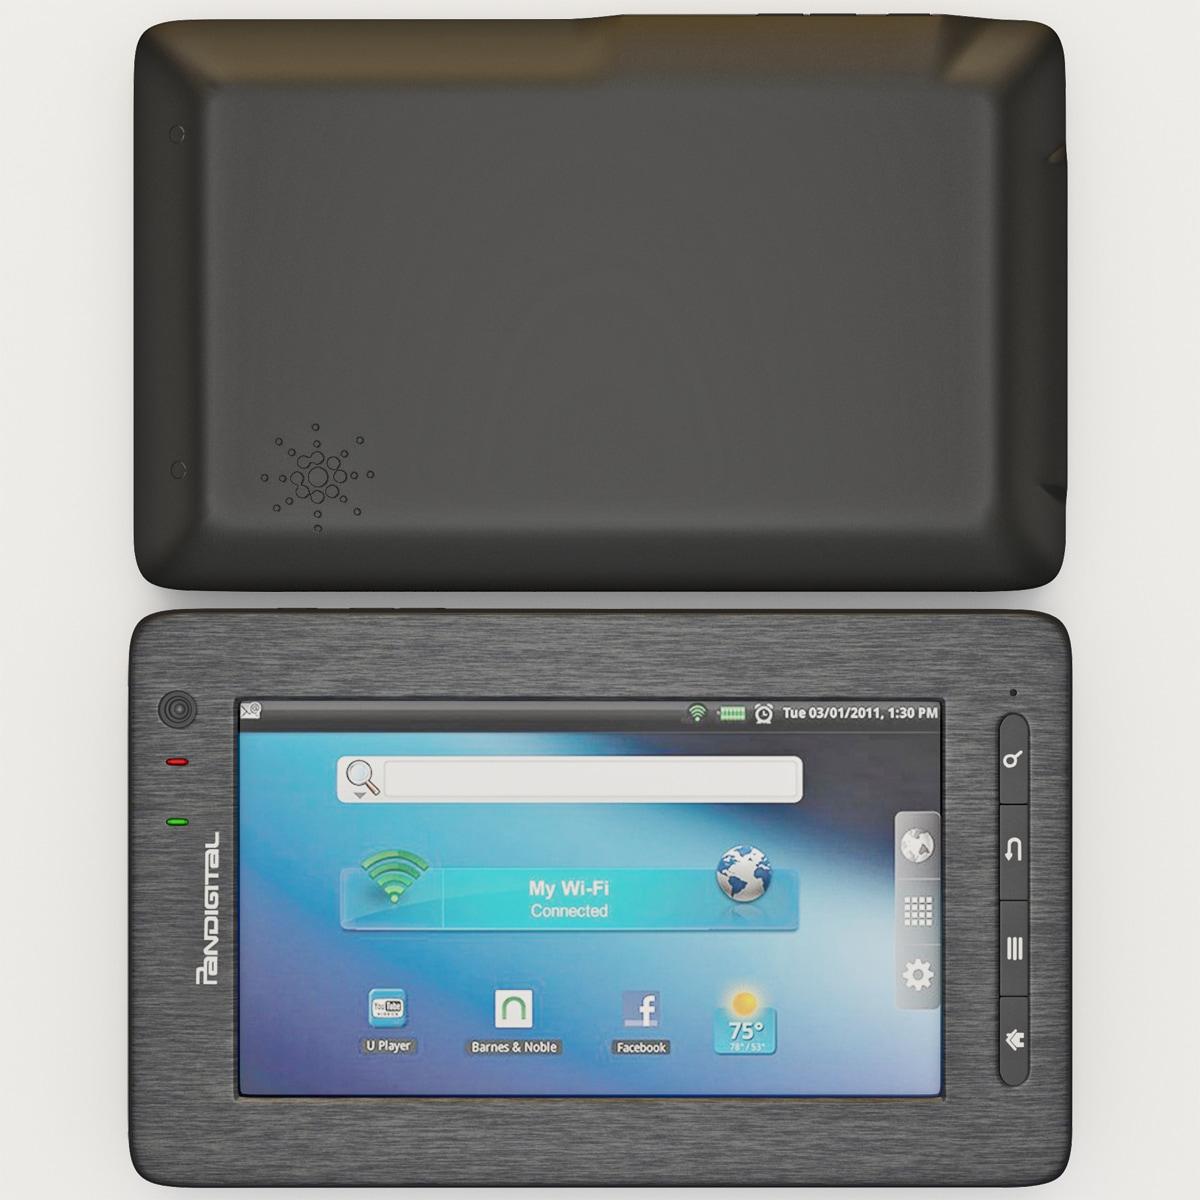 170340_Tablet_PanDigital_R70B200_Star_001.jpg